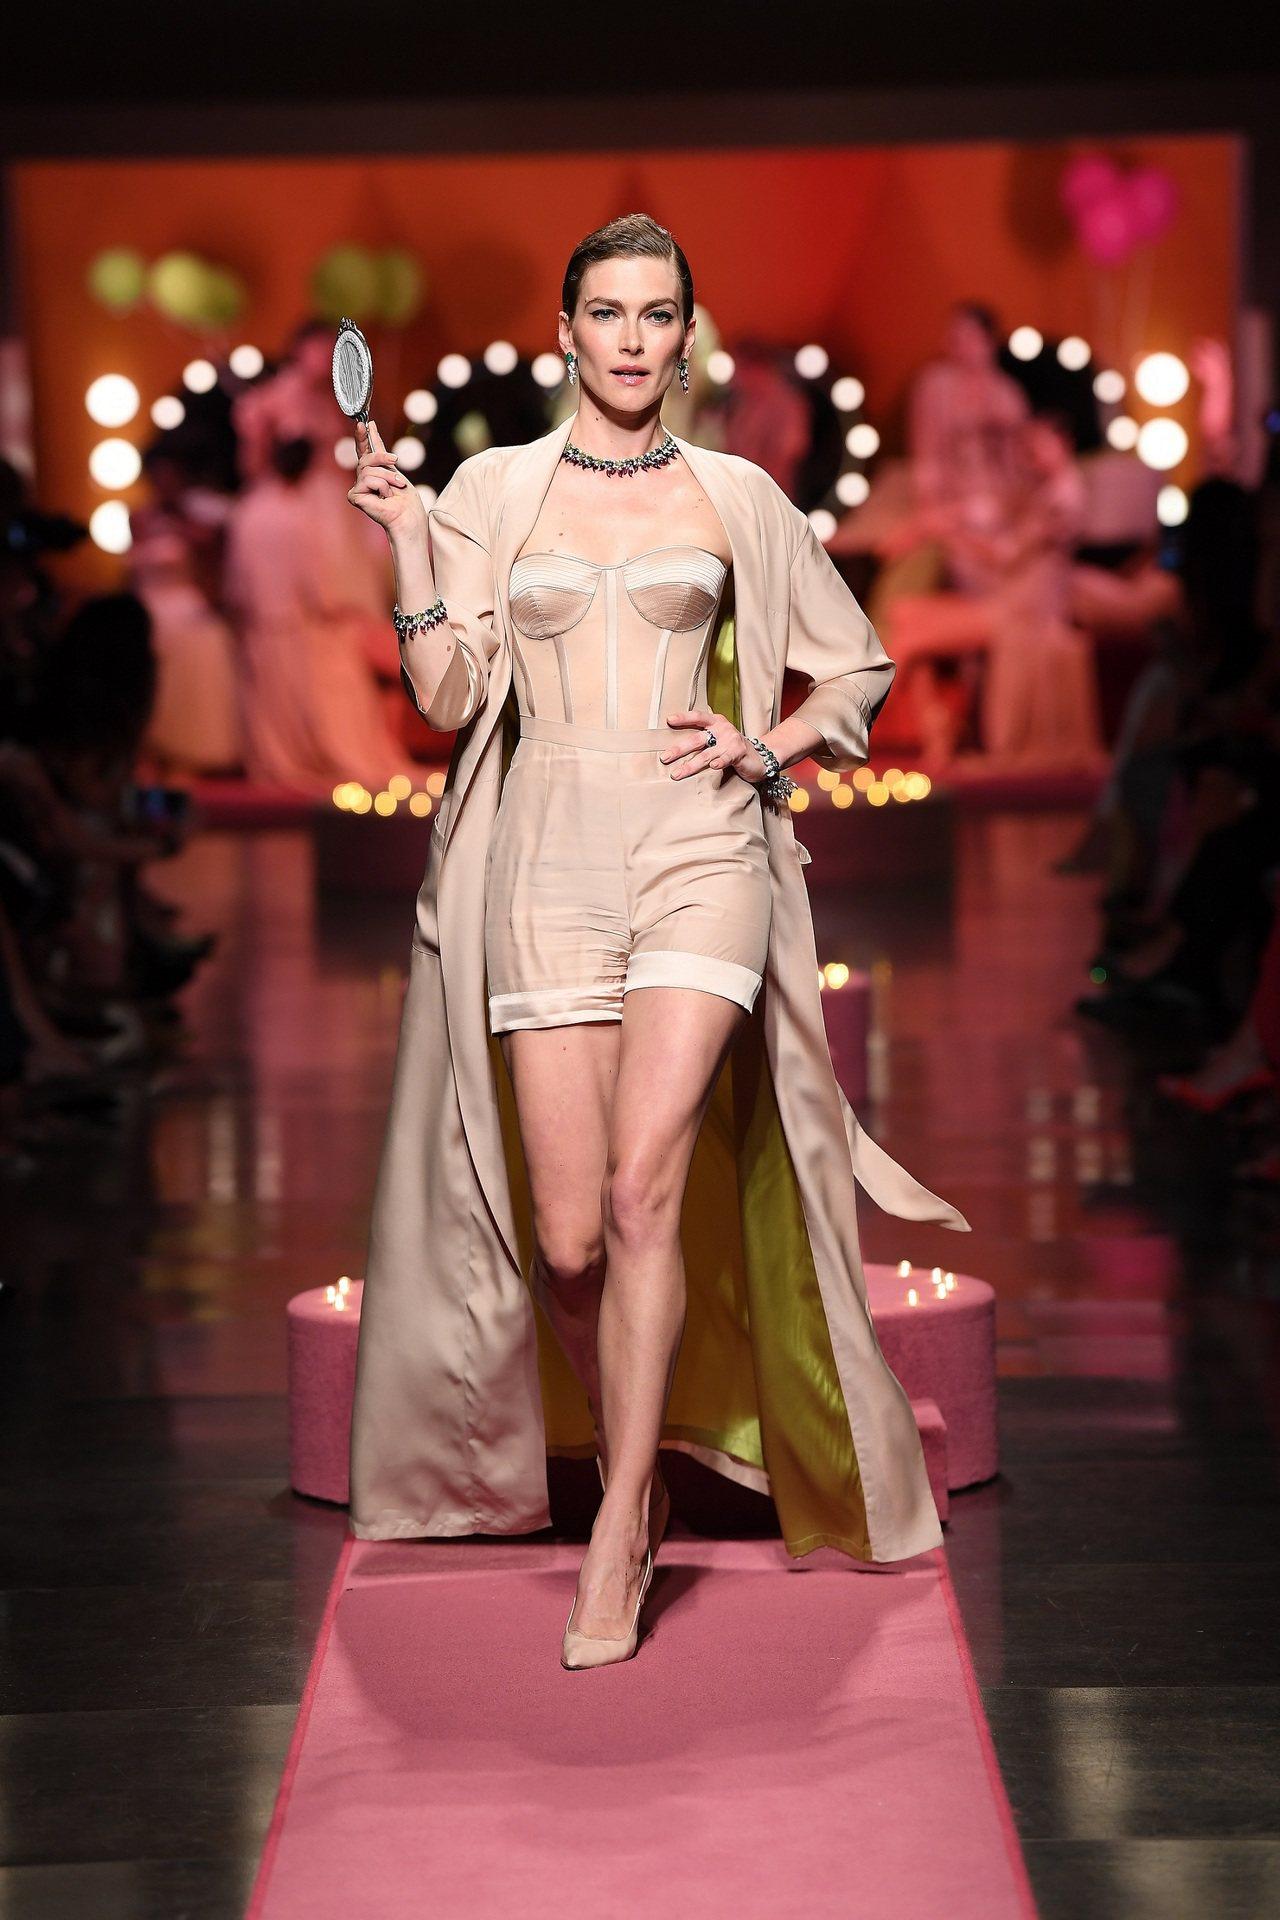 Model於寶格麗威尼斯FESTA慶典頂級珠寶秀上,完美演繹BVLGARI FE...